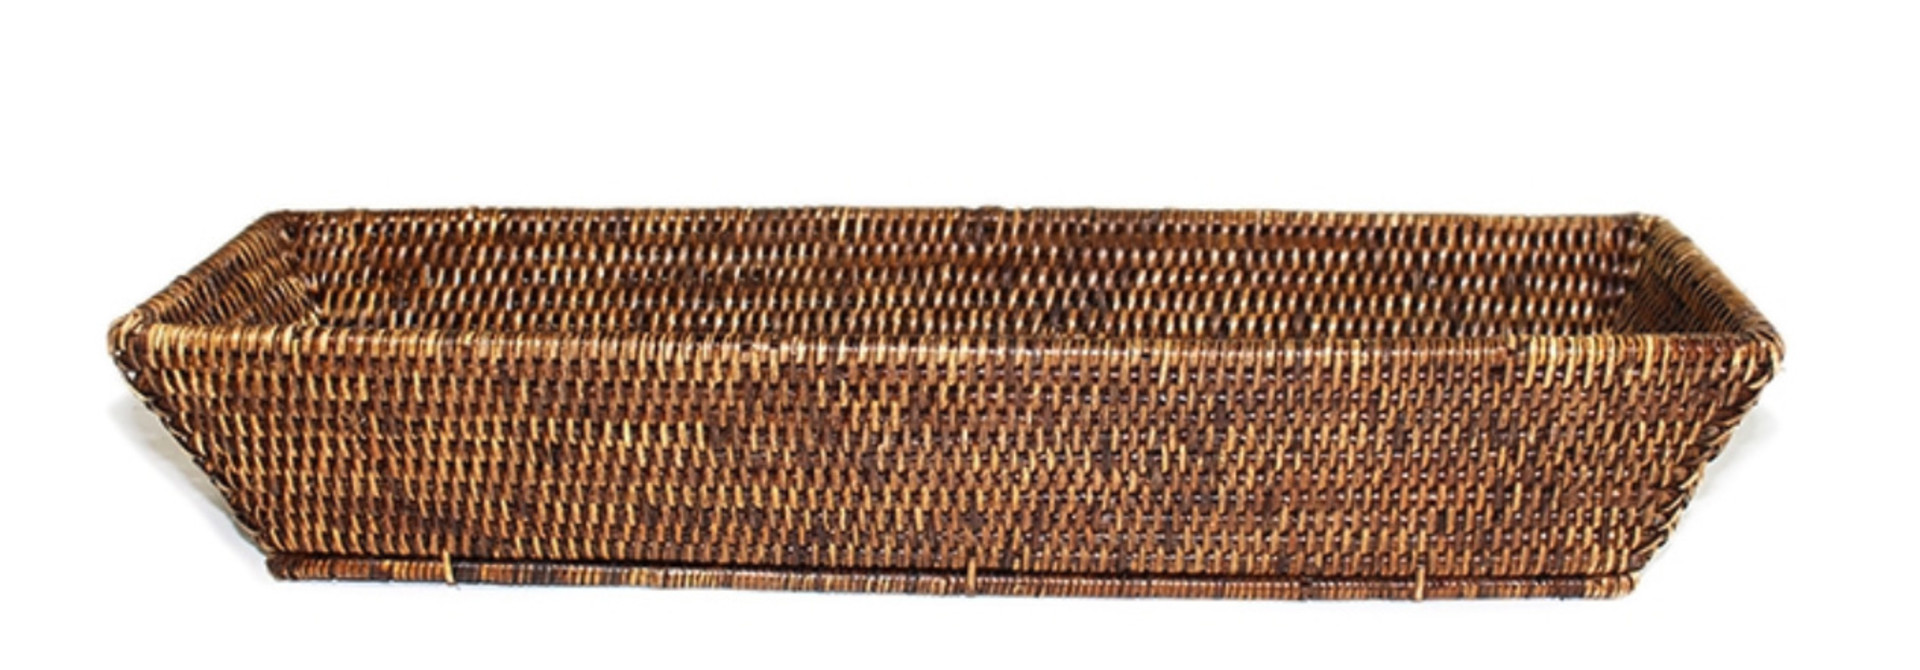 Rectangular Bread Tray